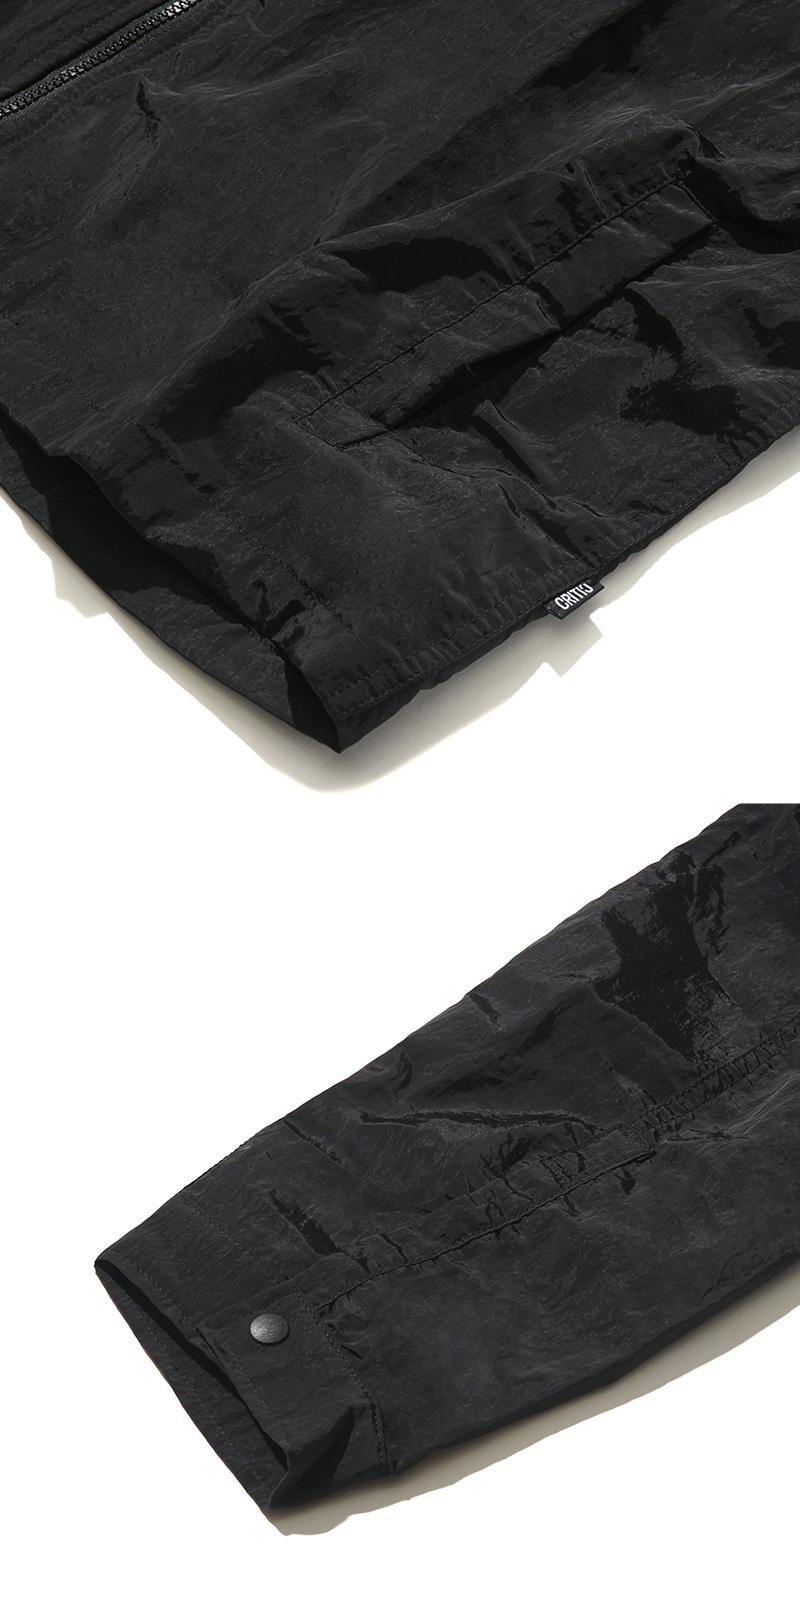 POLY ZIP-UP JACKET(BLACK)_CTONAJK02UC6